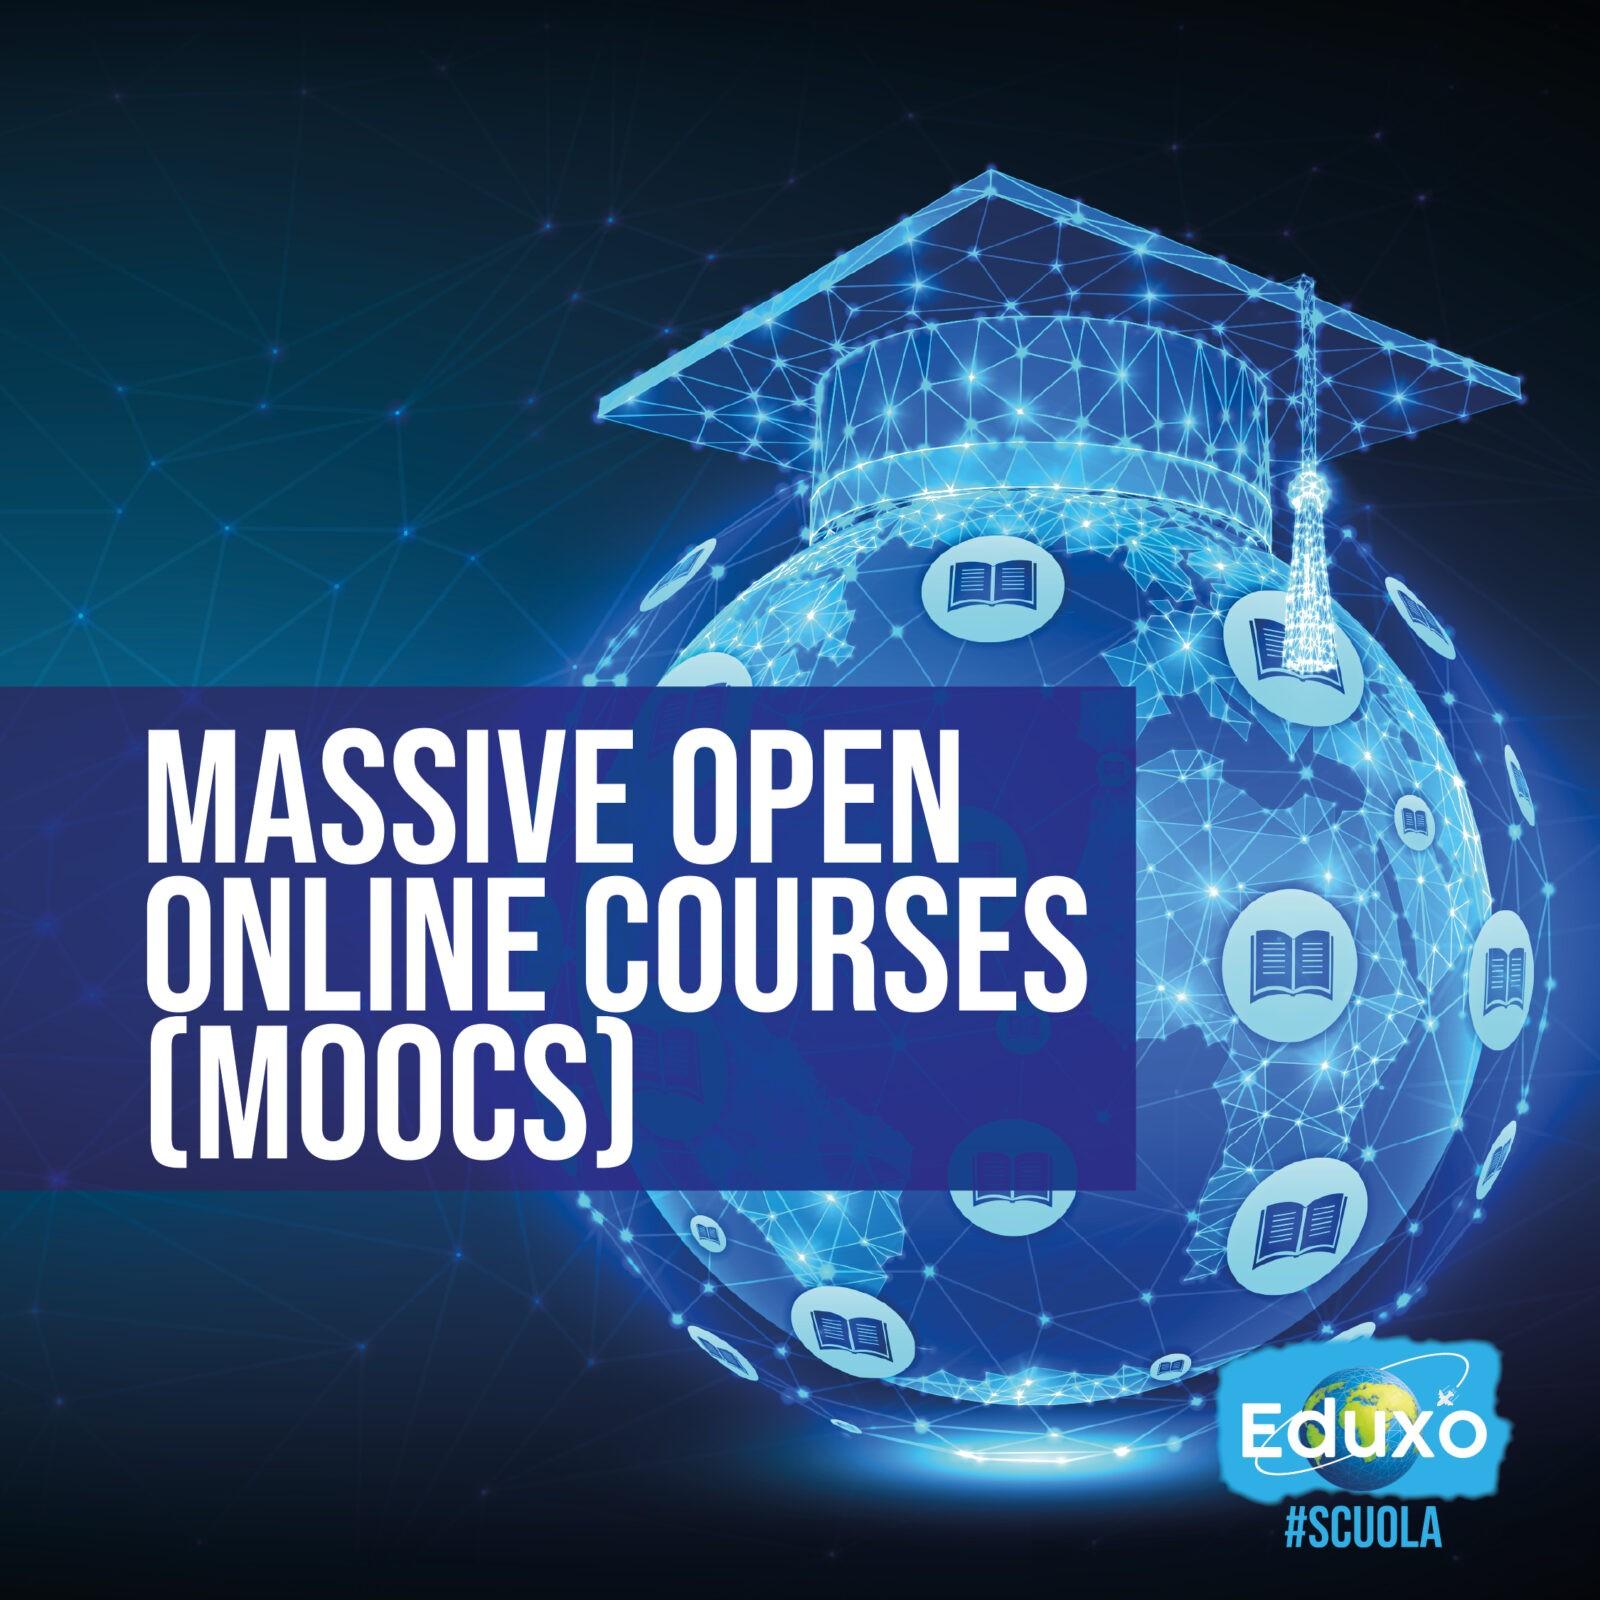 MOOCs: Massive Online Open Courses